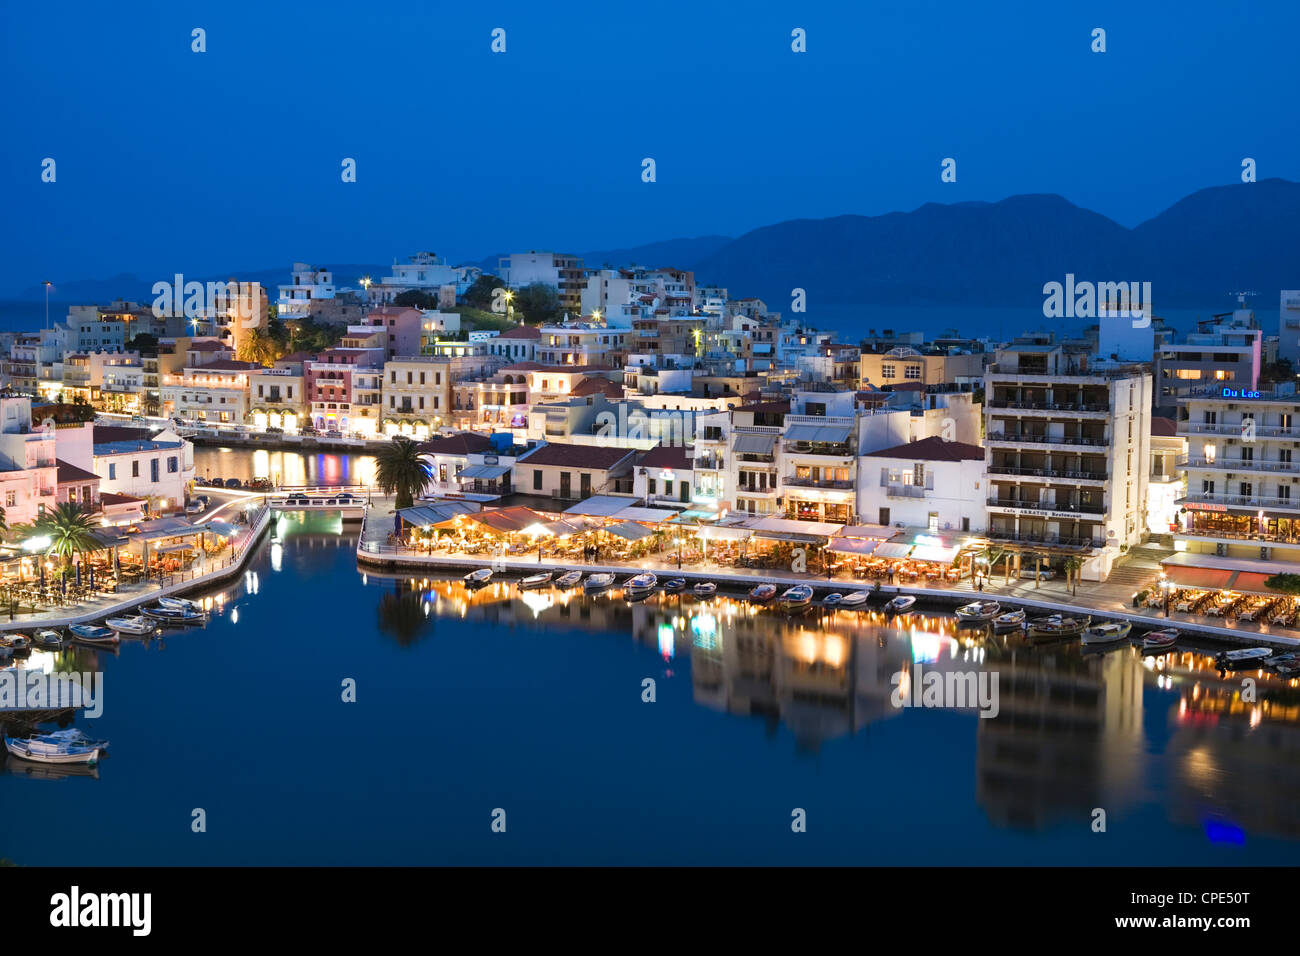 View over harbour and restaurants at dusk, Ayios Nikolaos, Lasithi region, Crete, Greek Islands, Greece, Europe - Stock Image